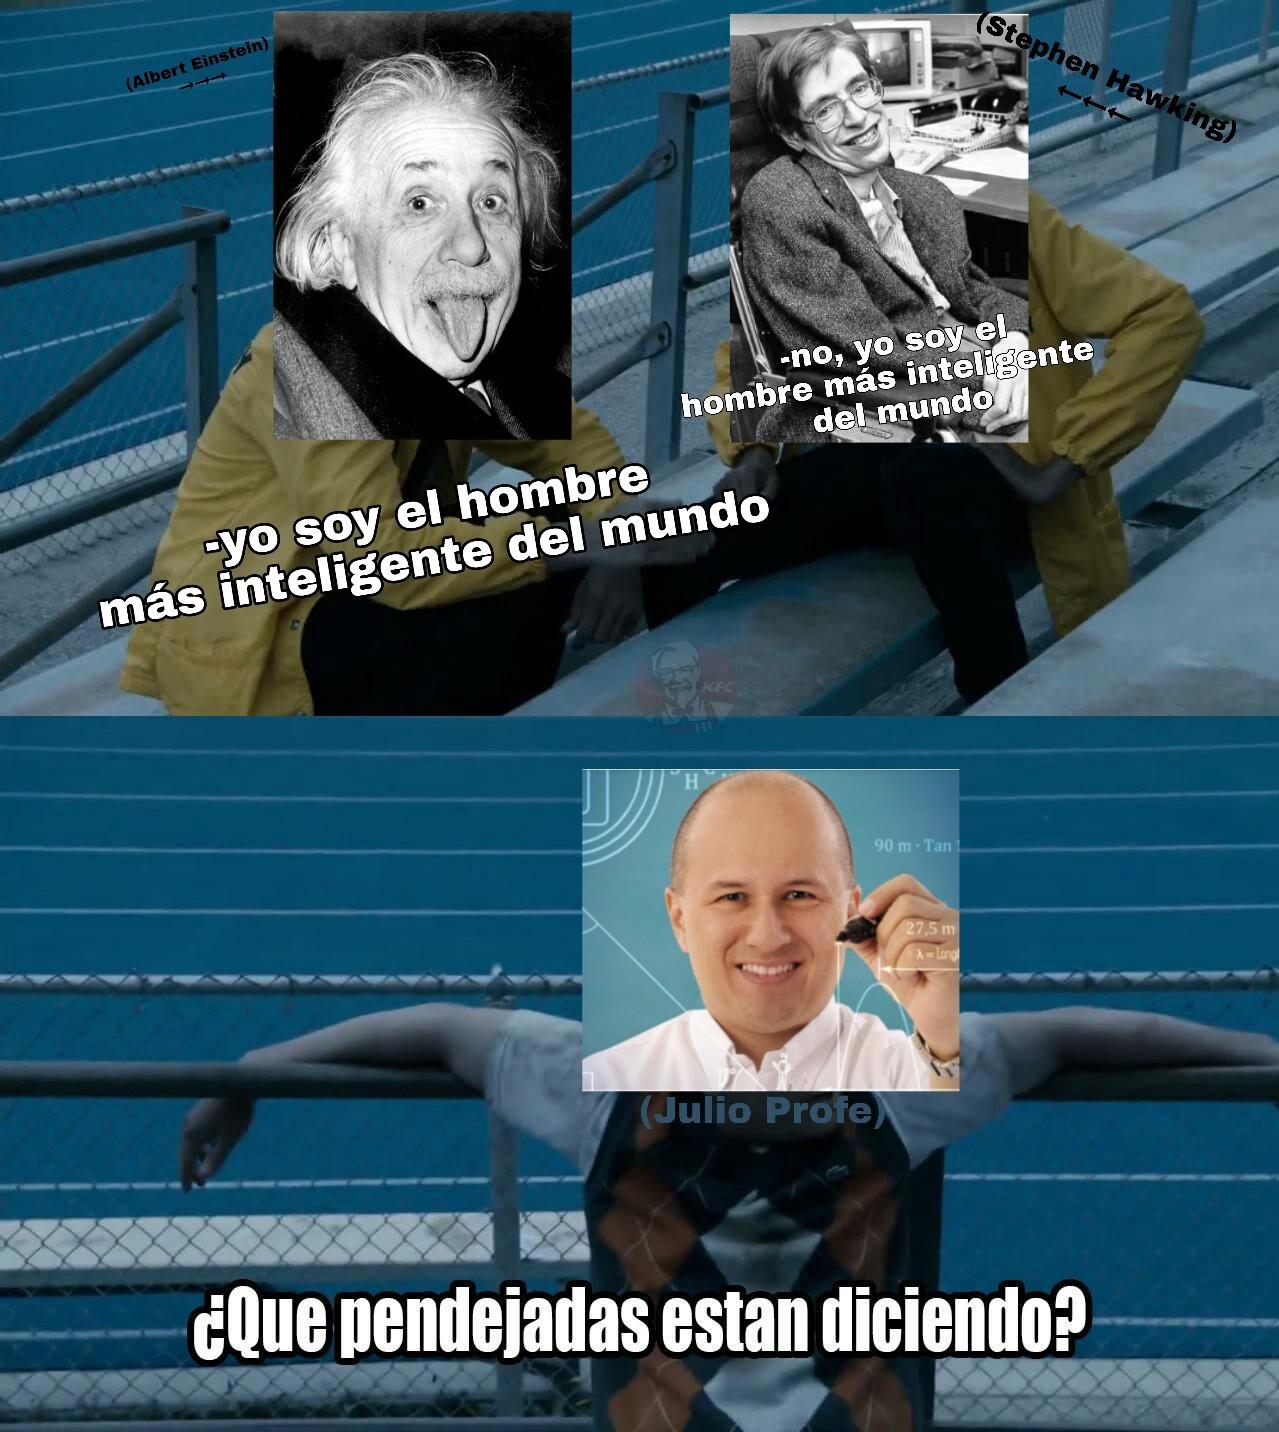 Julio Profe = El admin :son: - meme